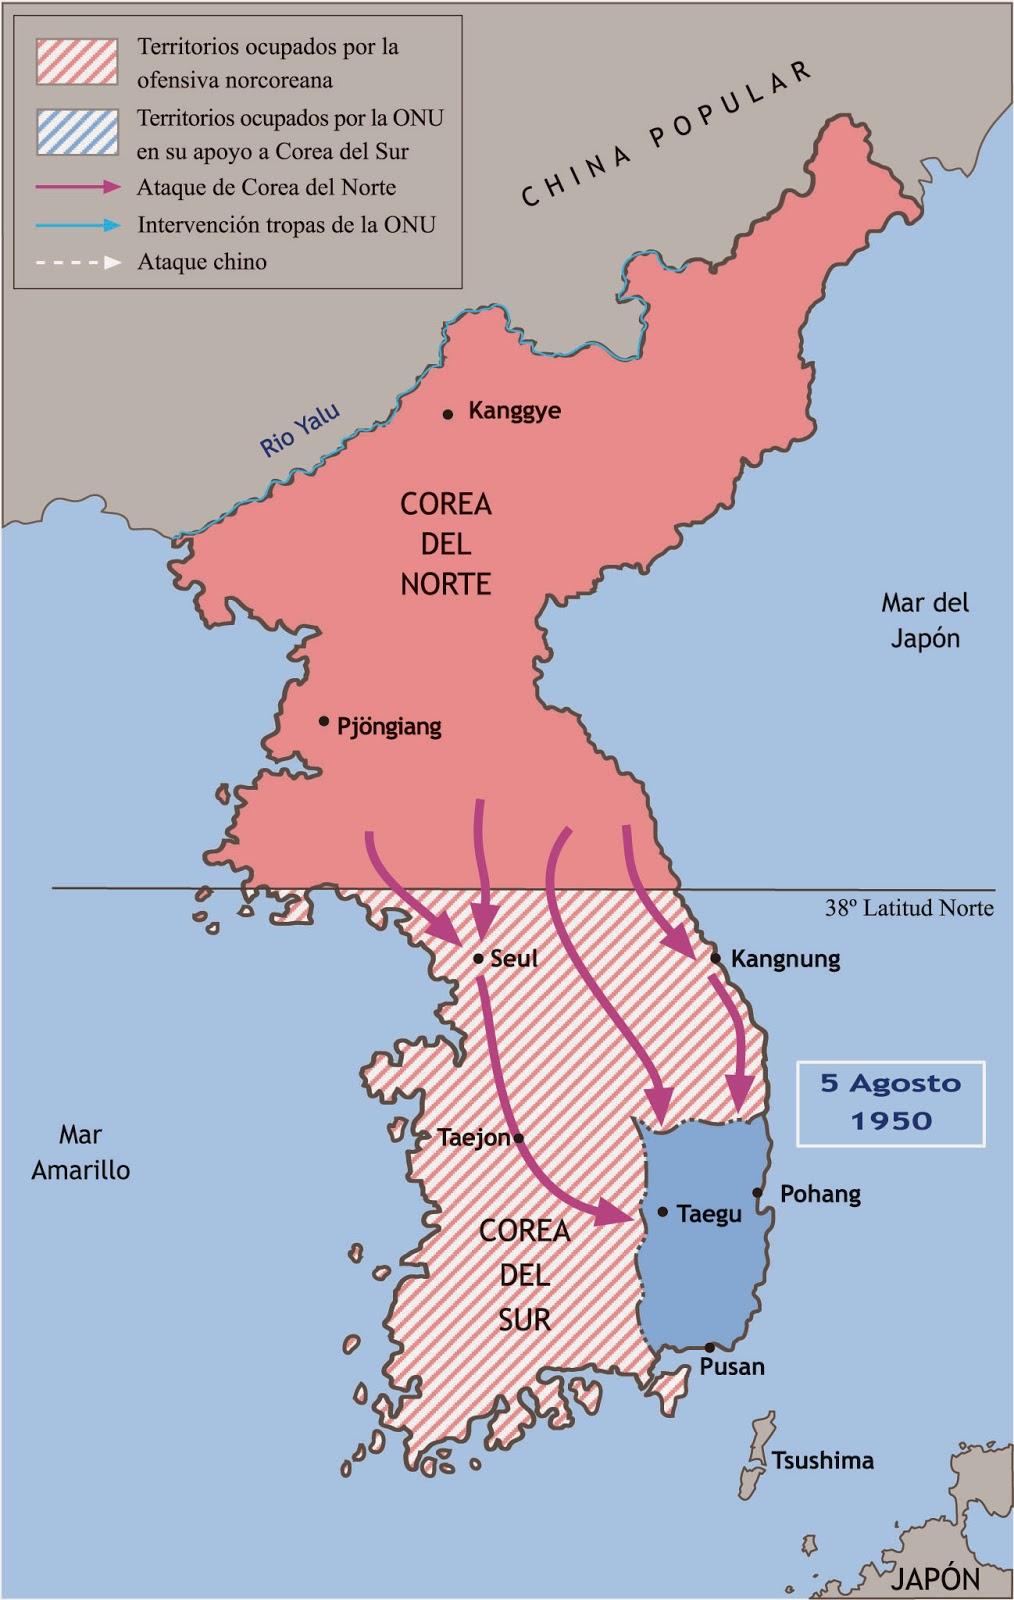 Guerra De Corea Mapa.Efectos De La Guerra Fria En La Guerra De Corea